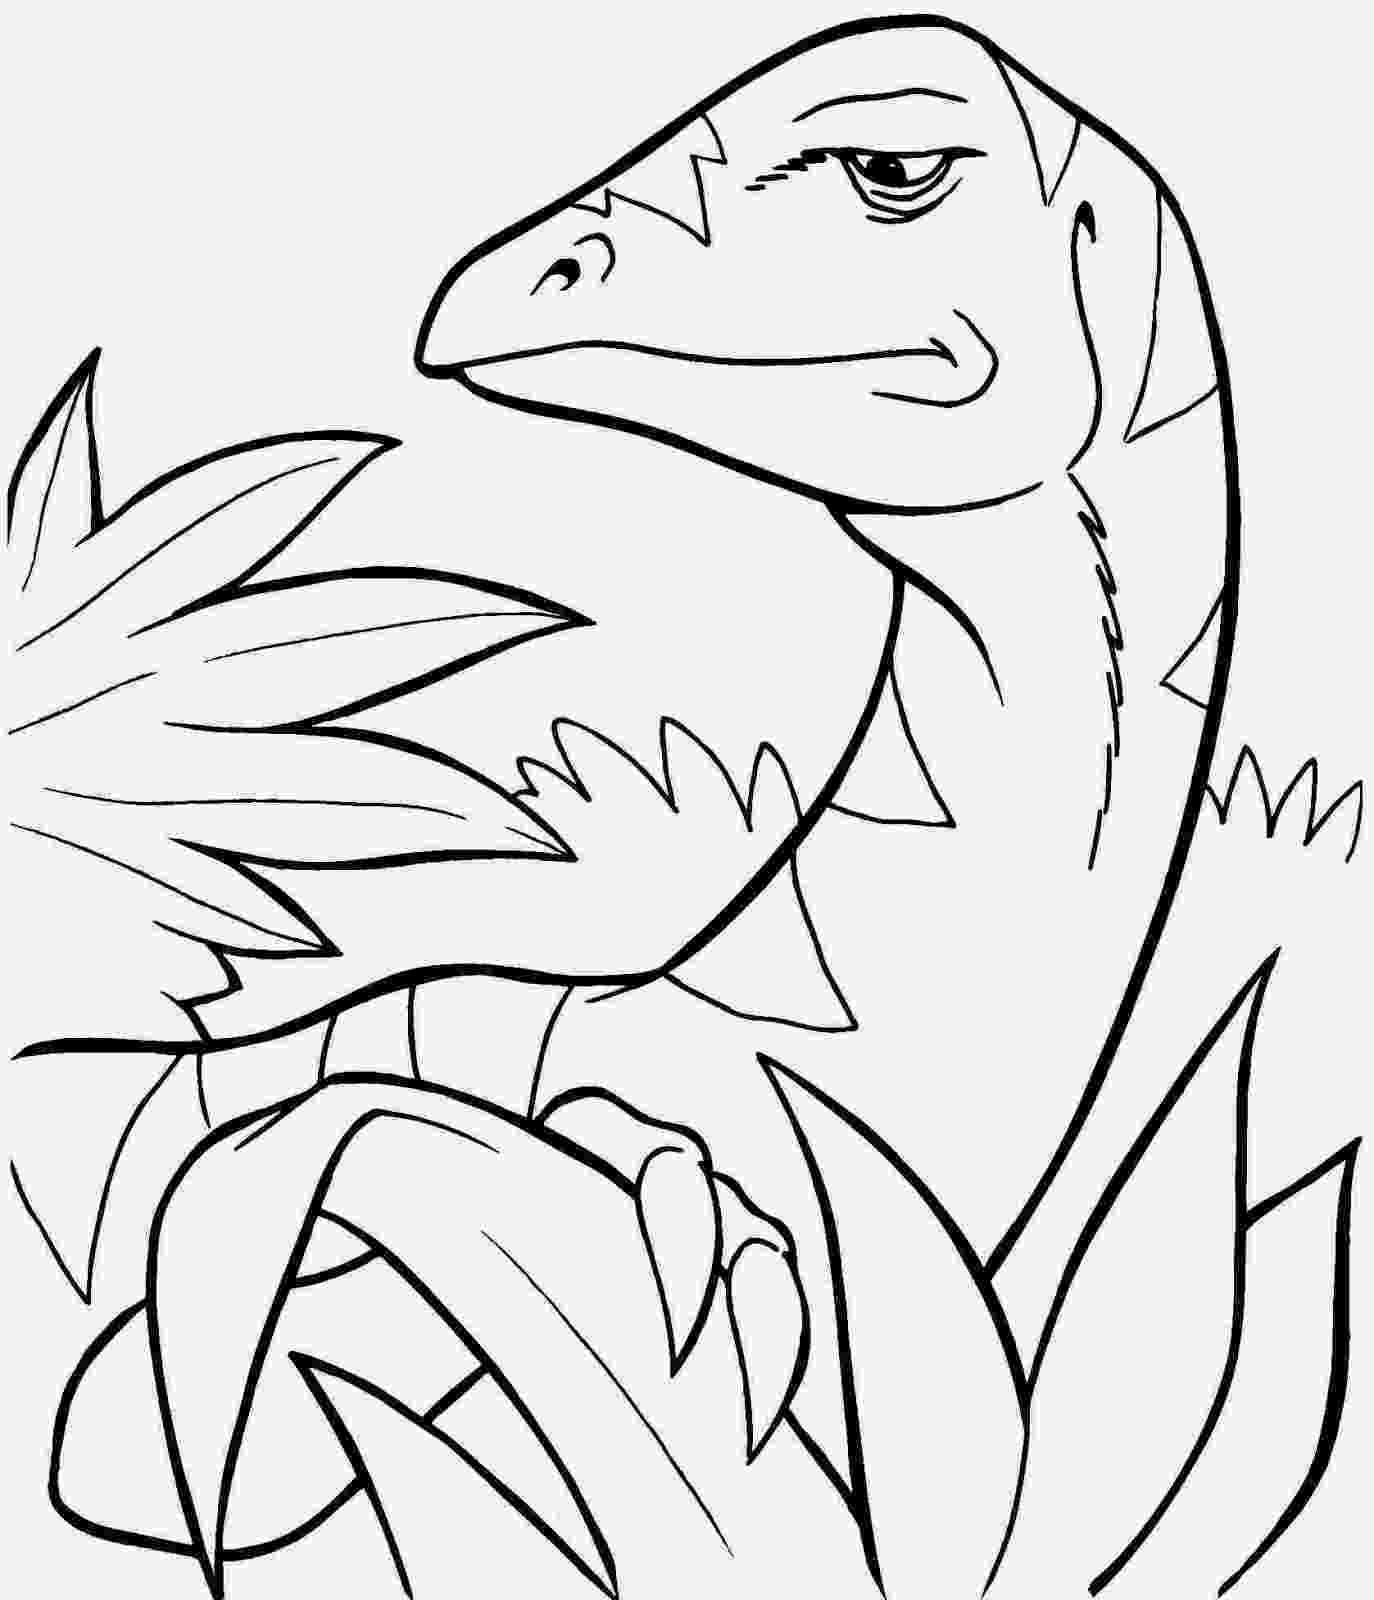 free dinosaur printables free printable dinosaur coloring pages for kids free dinosaur printables